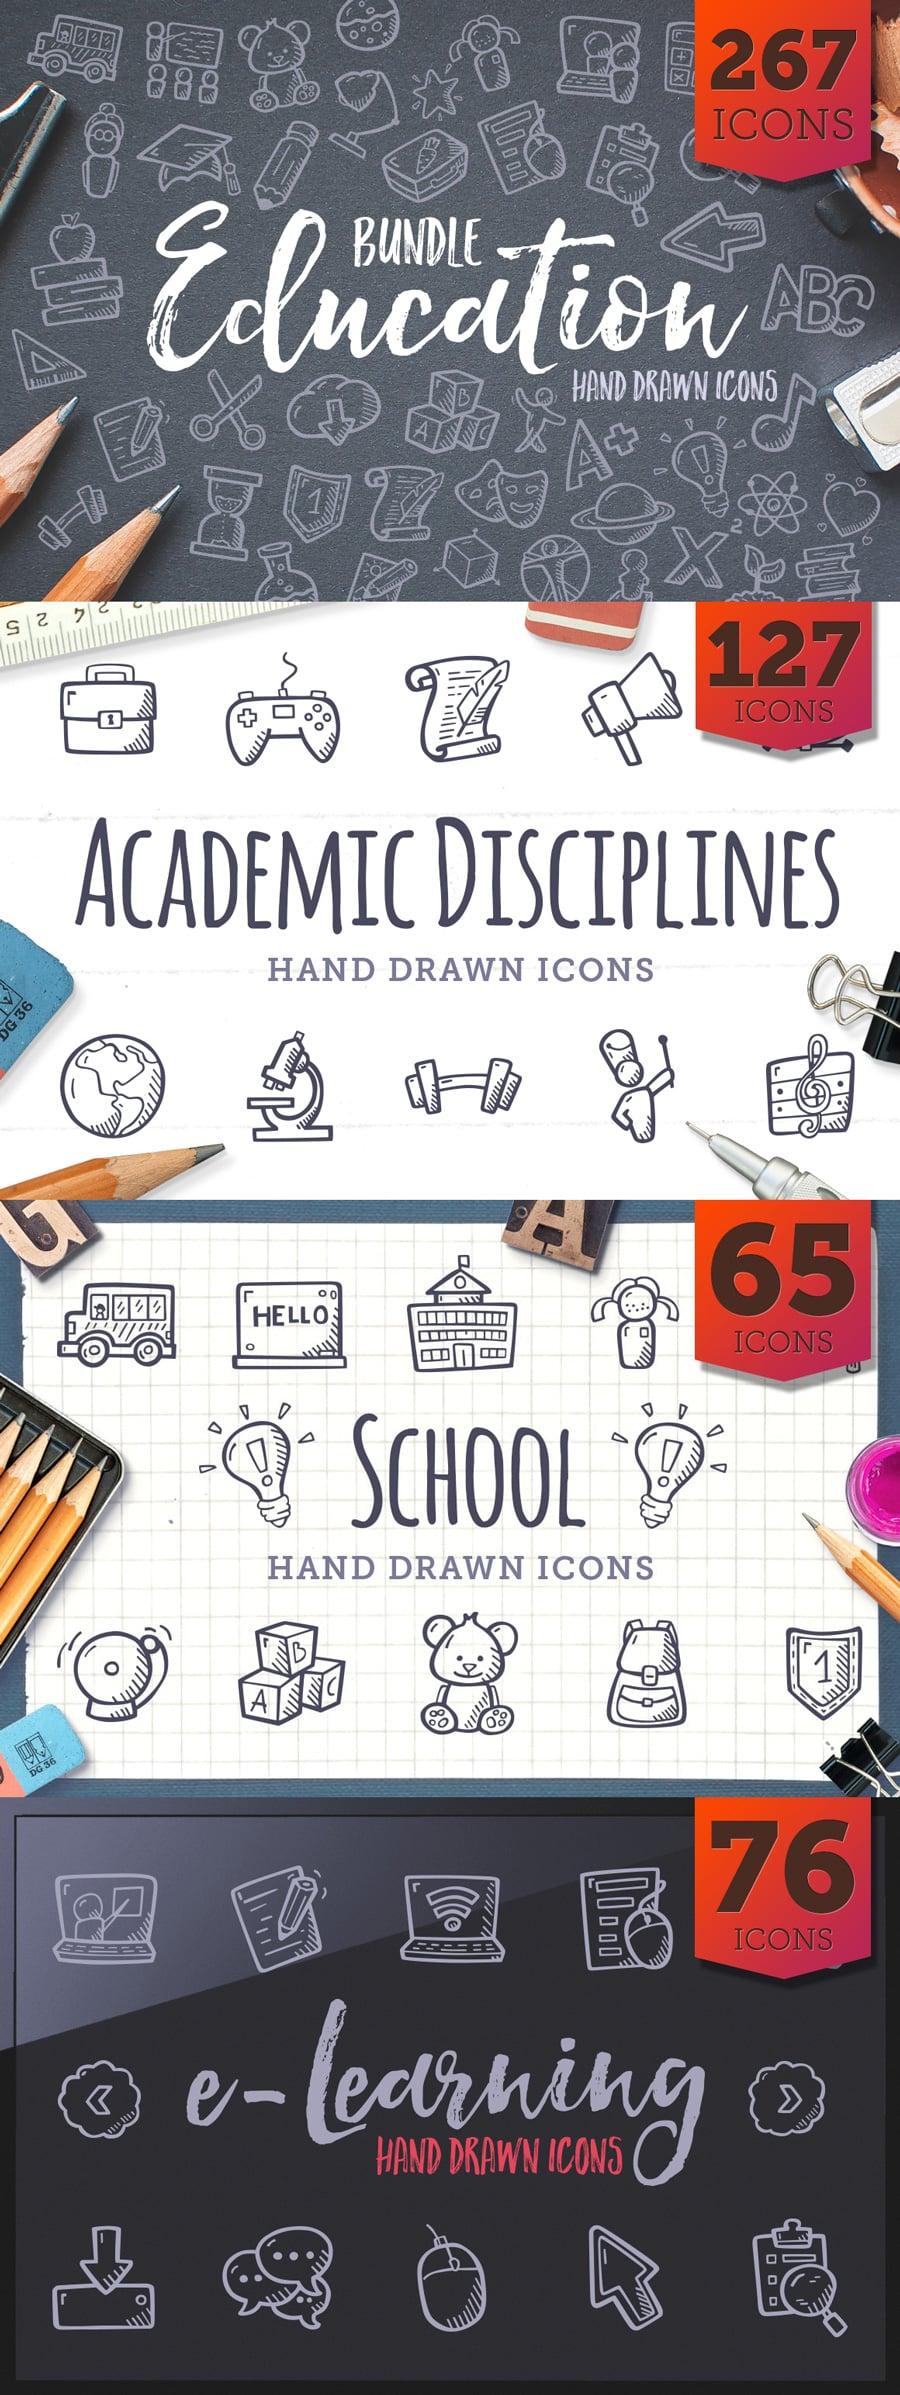 Education Bundle Icons - Hand Drawn Icons